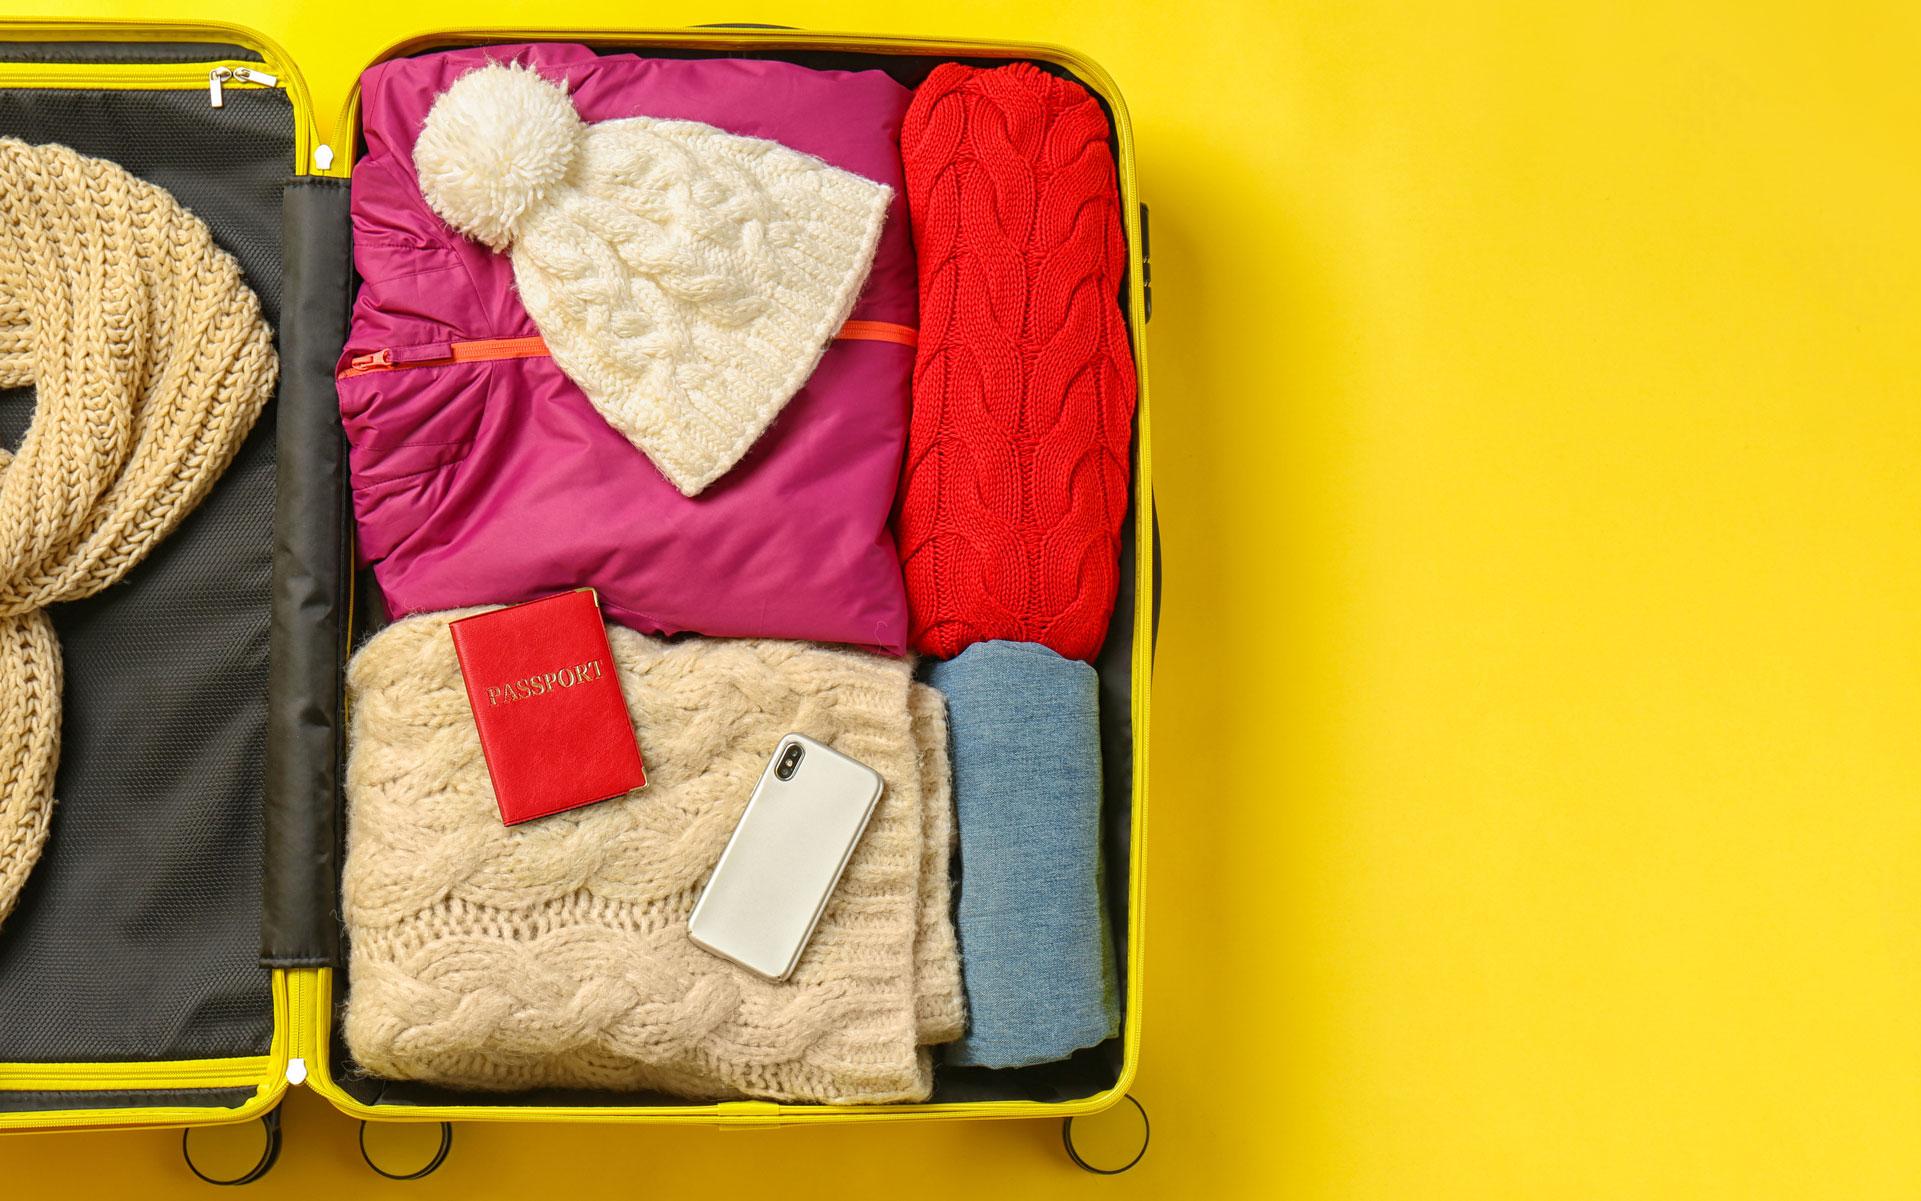 420-friendly travel destinations